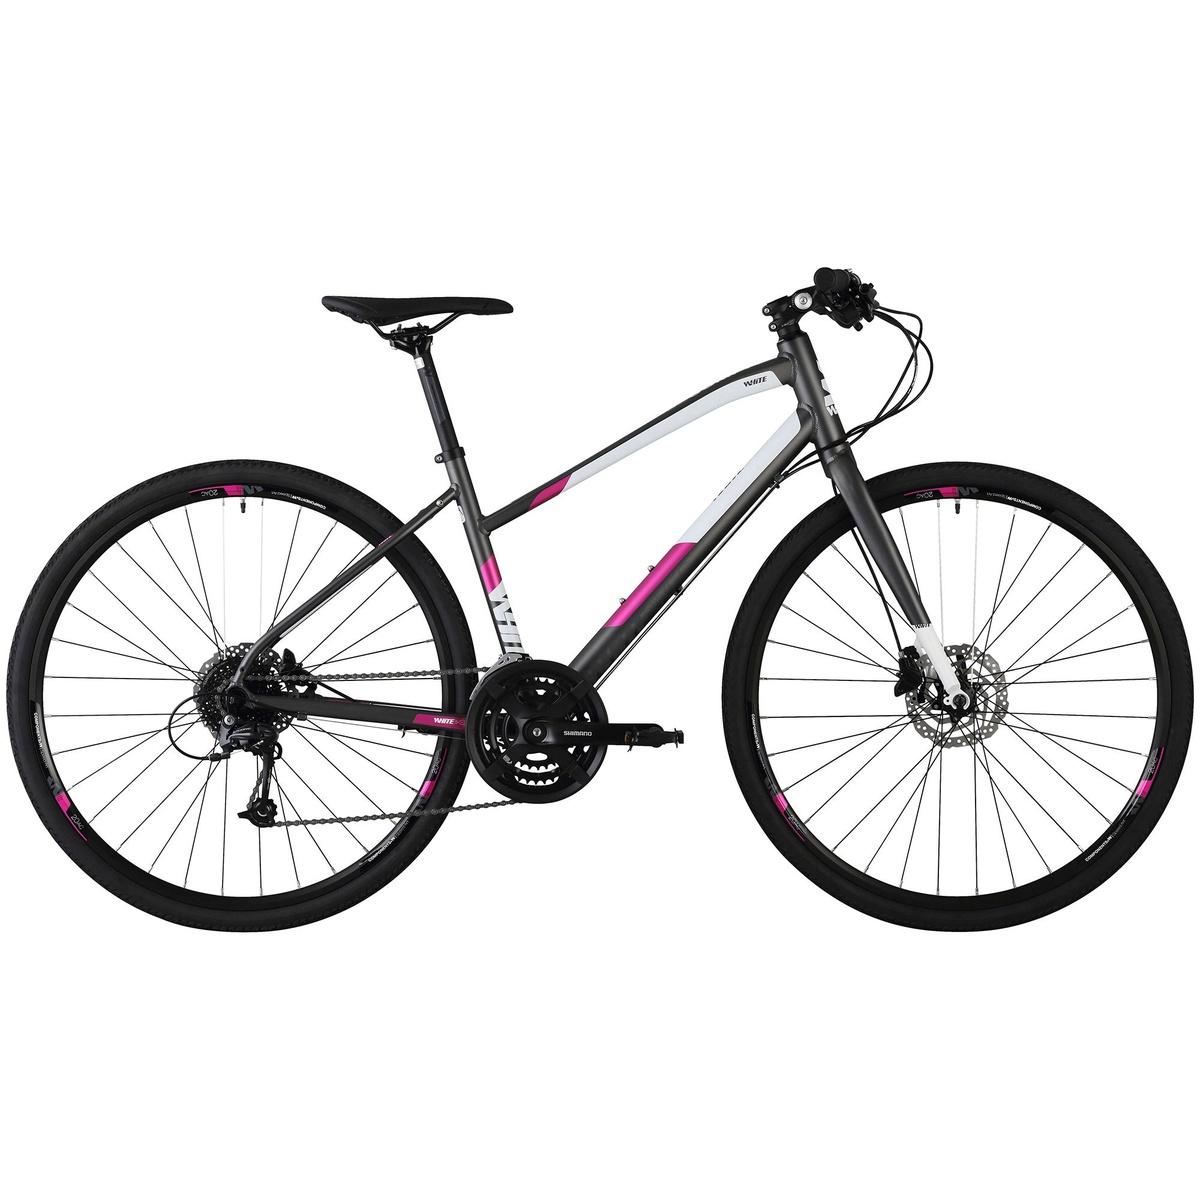 SC Comp FF Ane 19, hybridcykel, dame, Grå | City-cykler